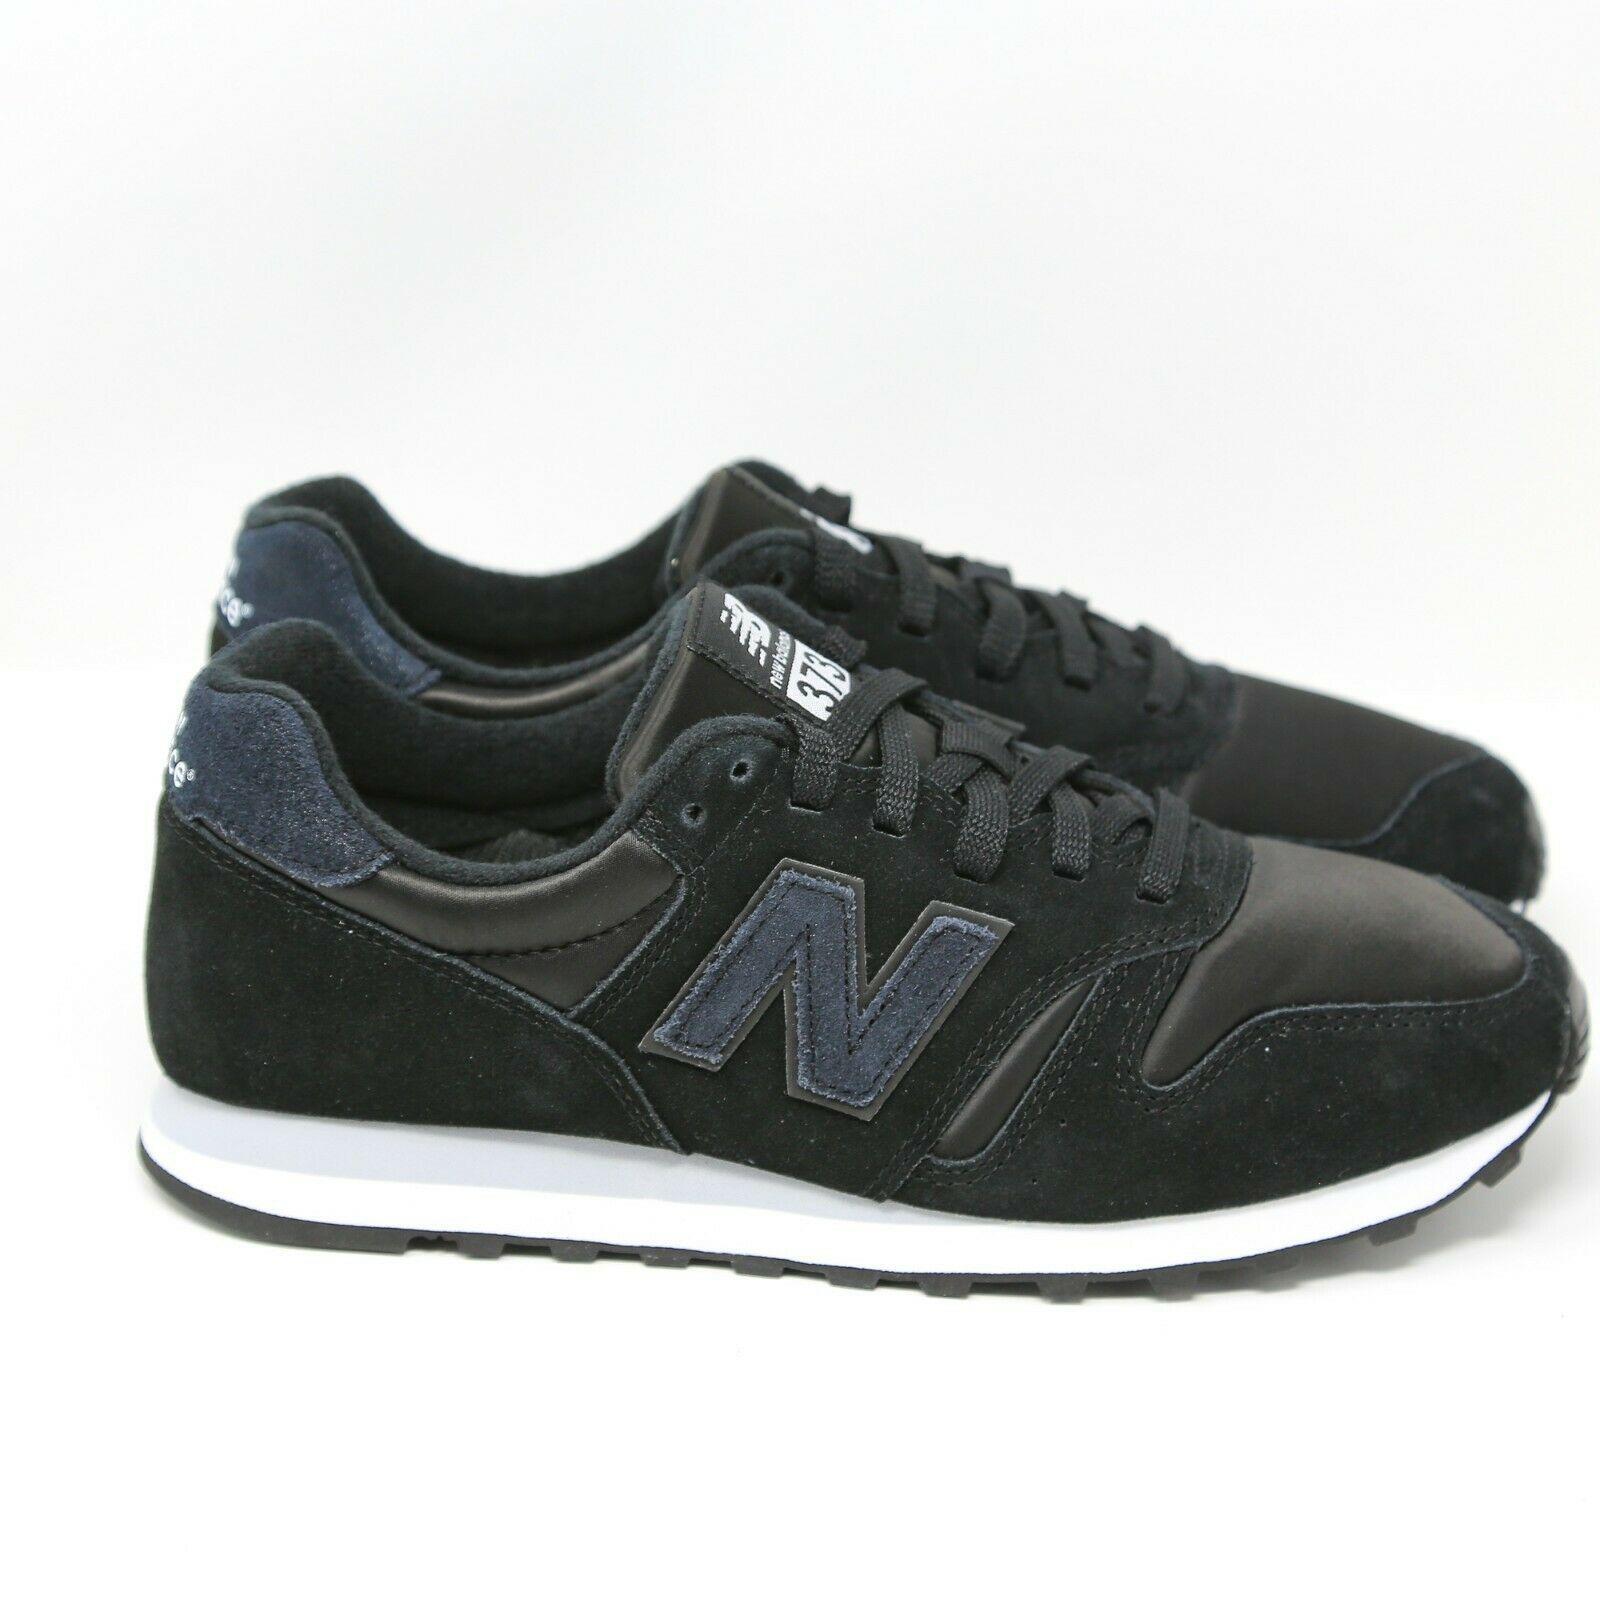 New Balance Nb 373 WL373KSP Negro Plata Visón Mujer Talla 8 Eur 39 UK 6 Running image 8